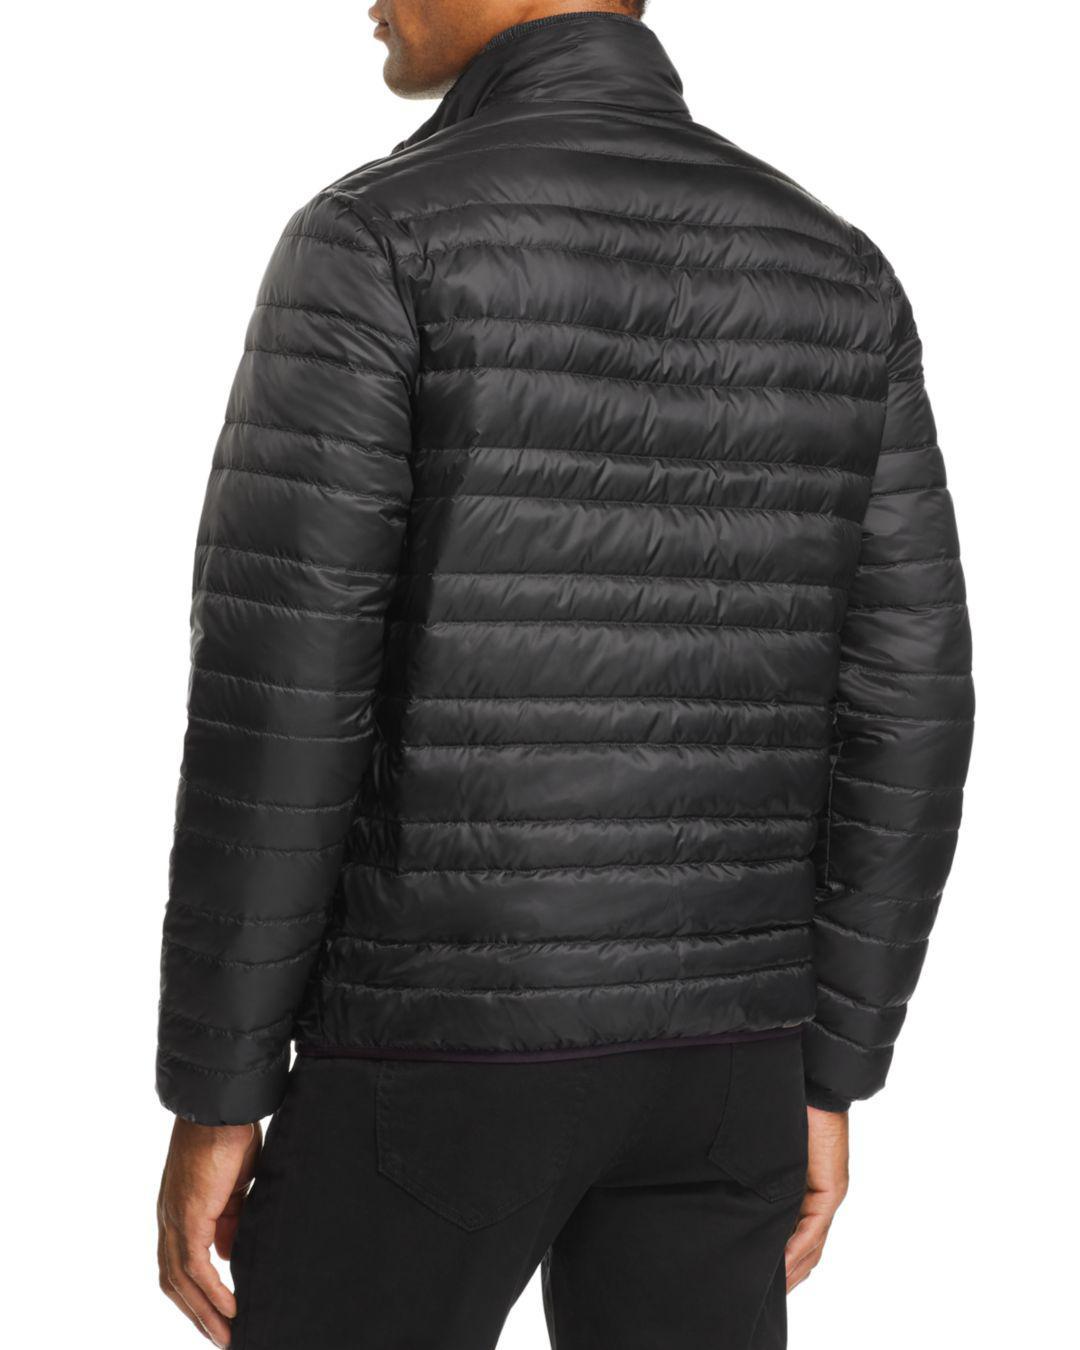 d231a749ec56 Michael Kors Reversible Down Jacket in Black for Men - Lyst